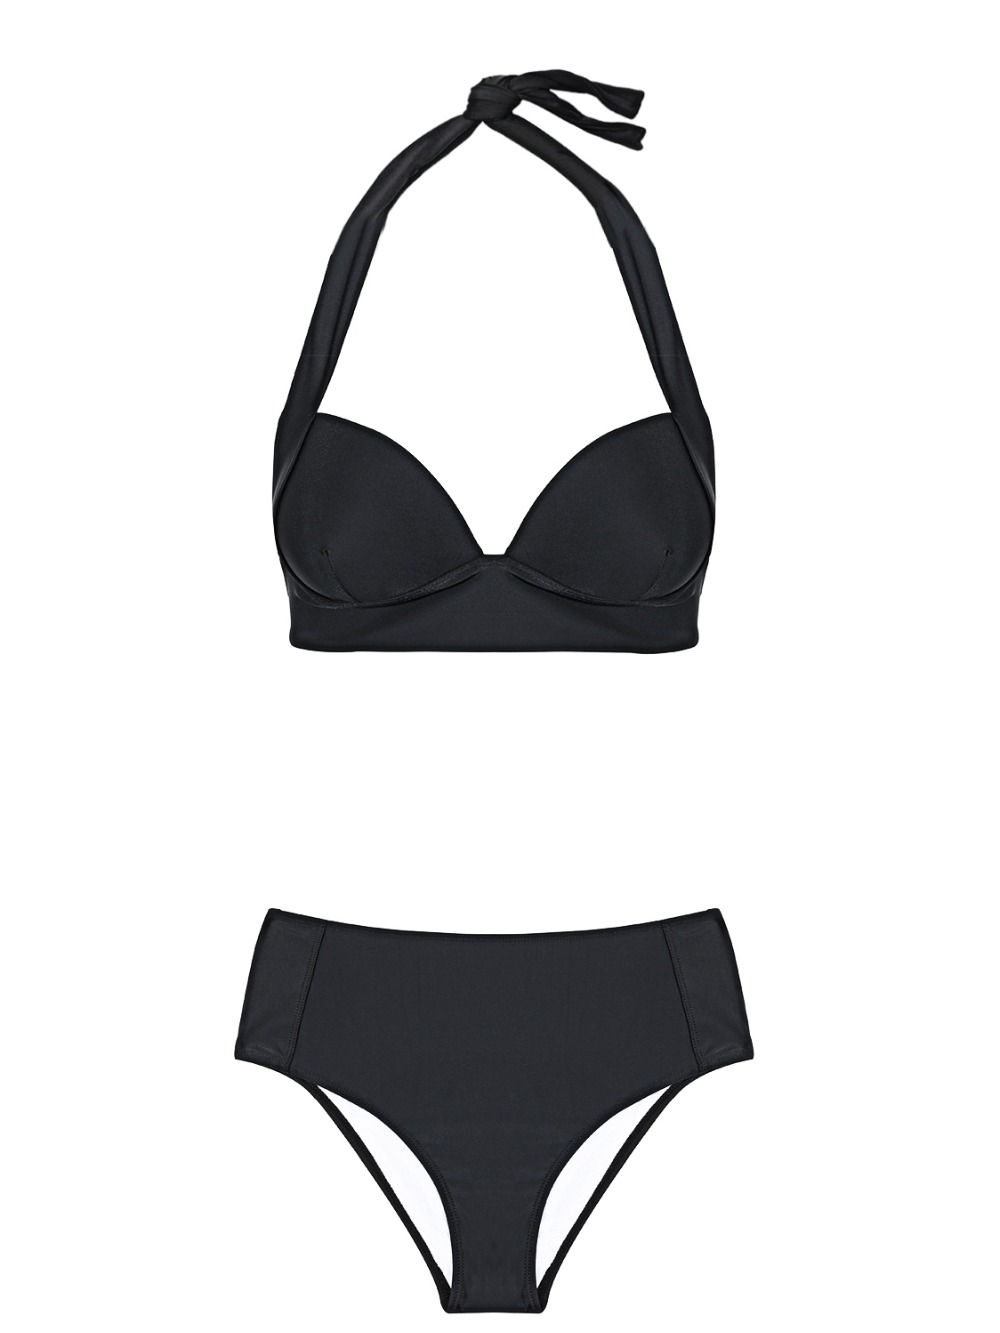 HTB1T9Kcdf9TBuNjy0Fcq6zeiFXac - Halter high waist bikini women 2018 Push up plunge swimsuit solid sexy vintage swimwear female Sport bathing suit red bikini set